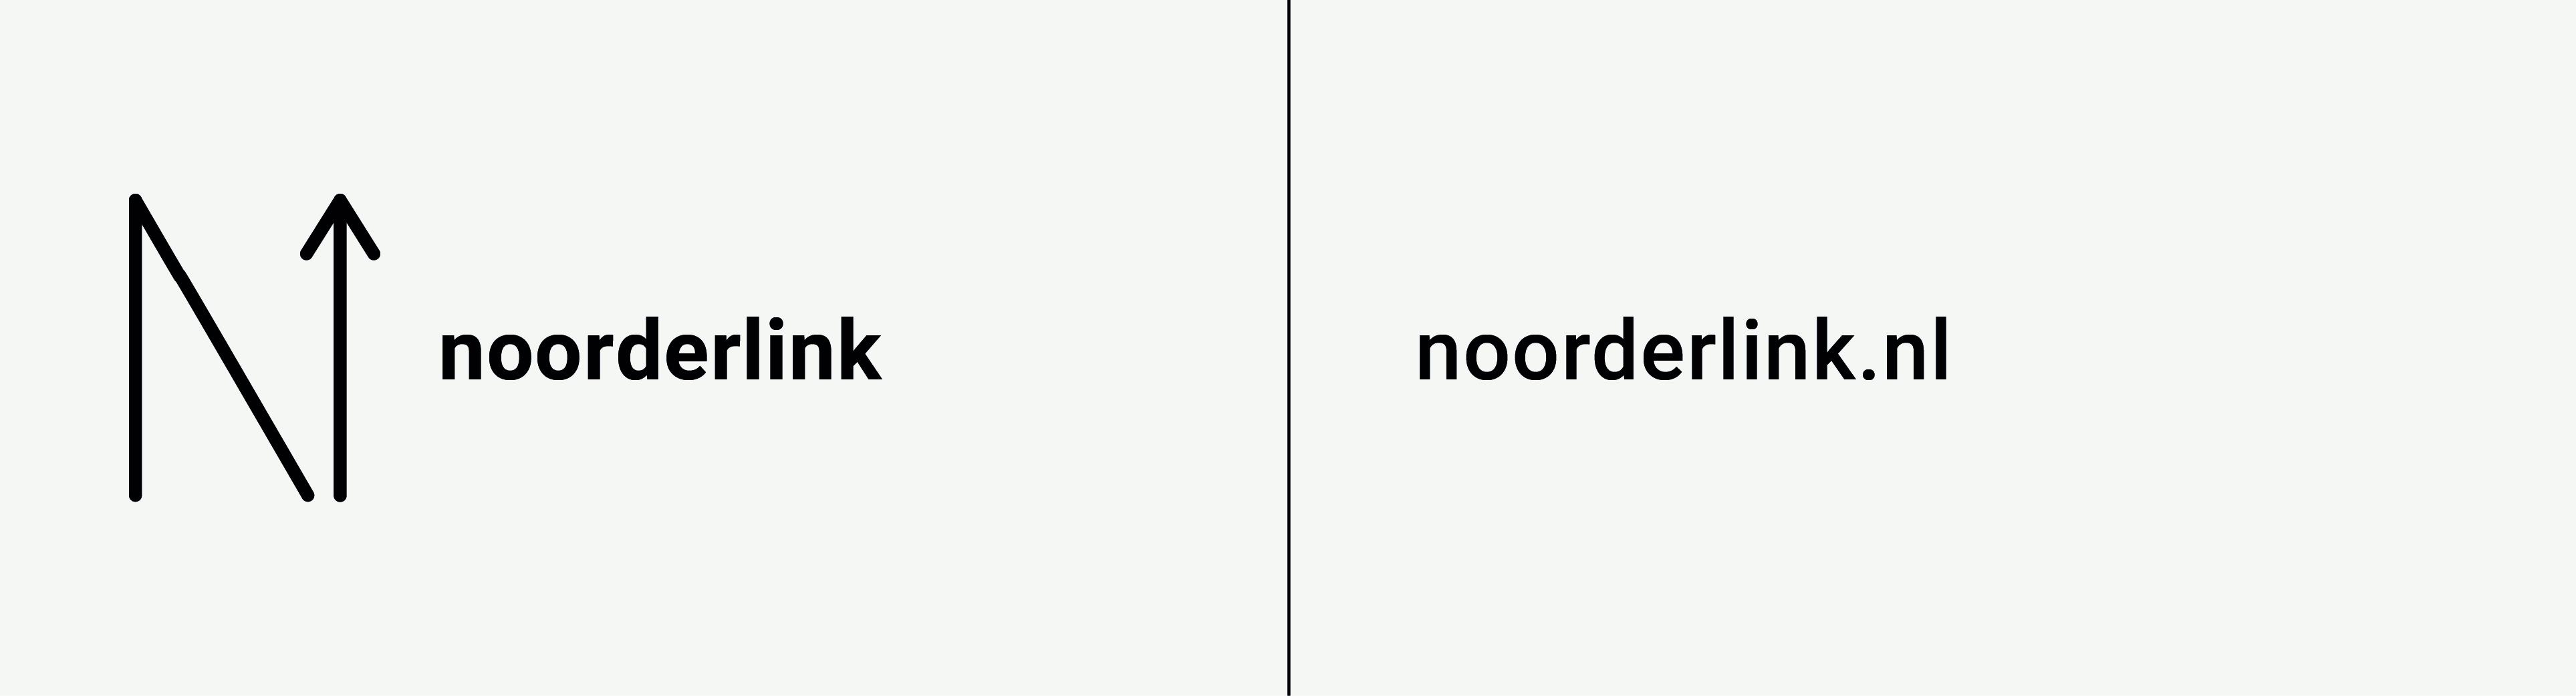 Noorderlink Careers: Lef'L Up! opleidingsprogramma september 2019